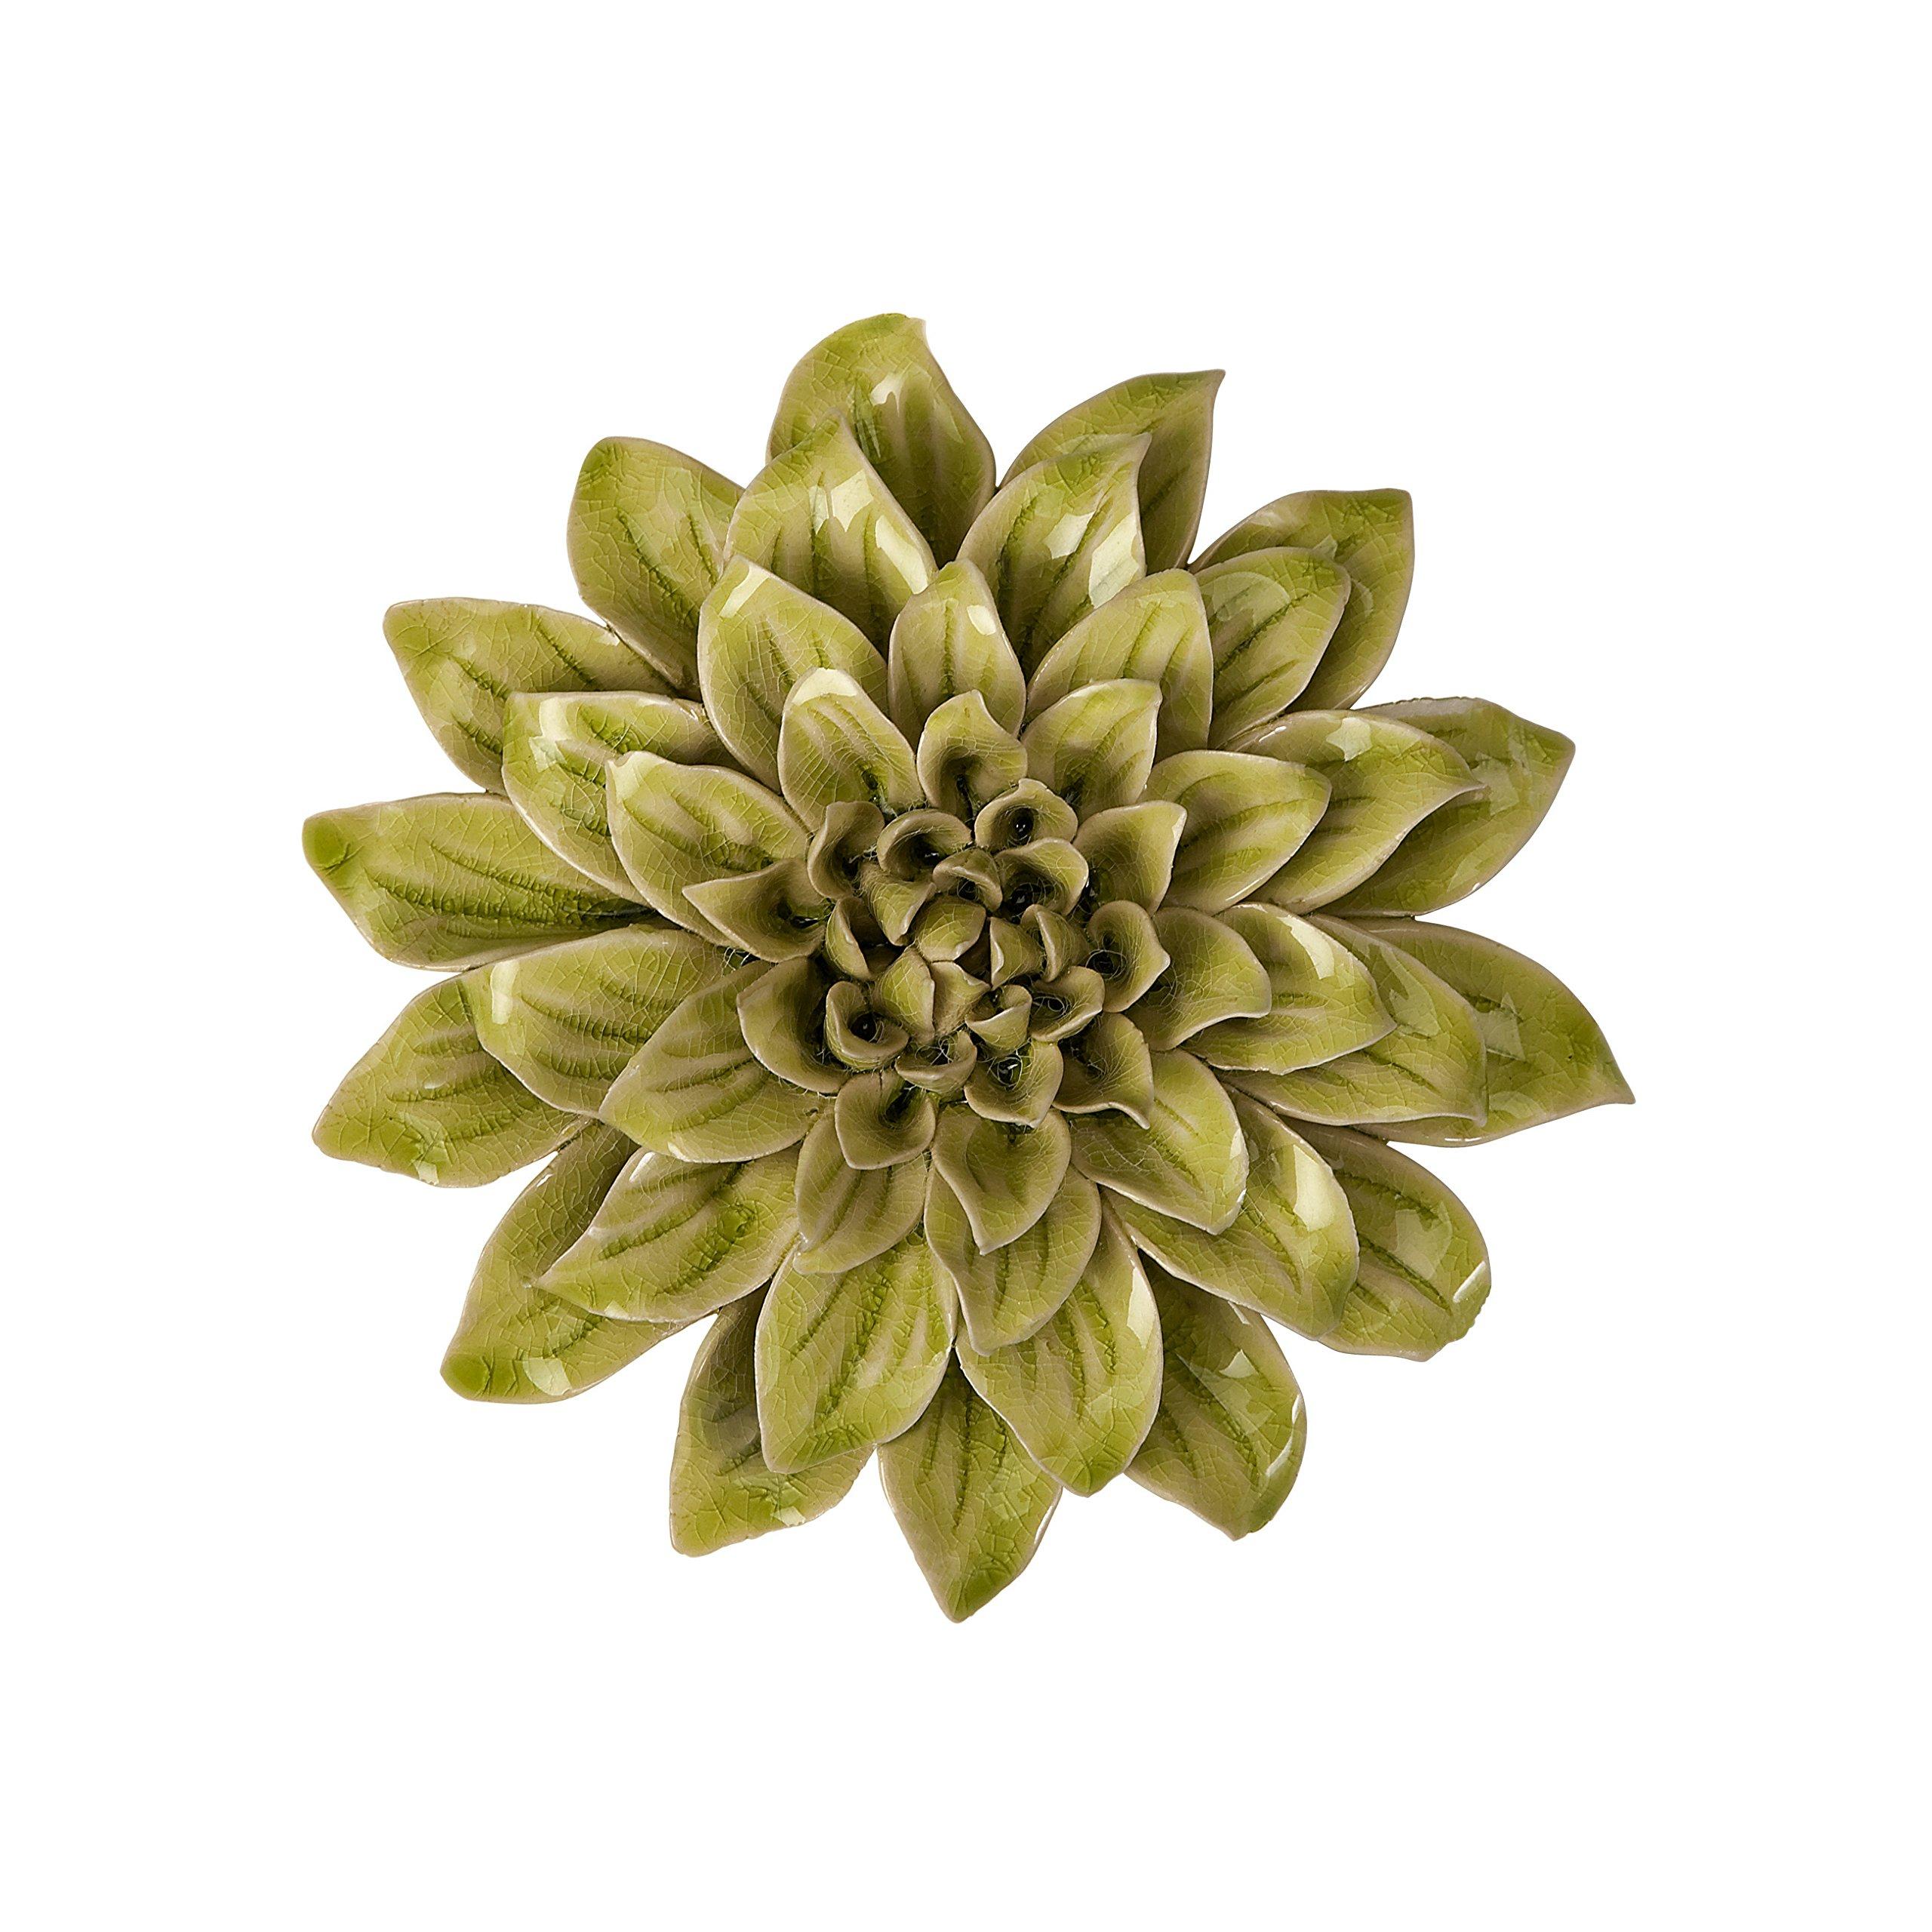 Ceramic Wall Flower Decor: Ceramic Flowers: Amazon.com